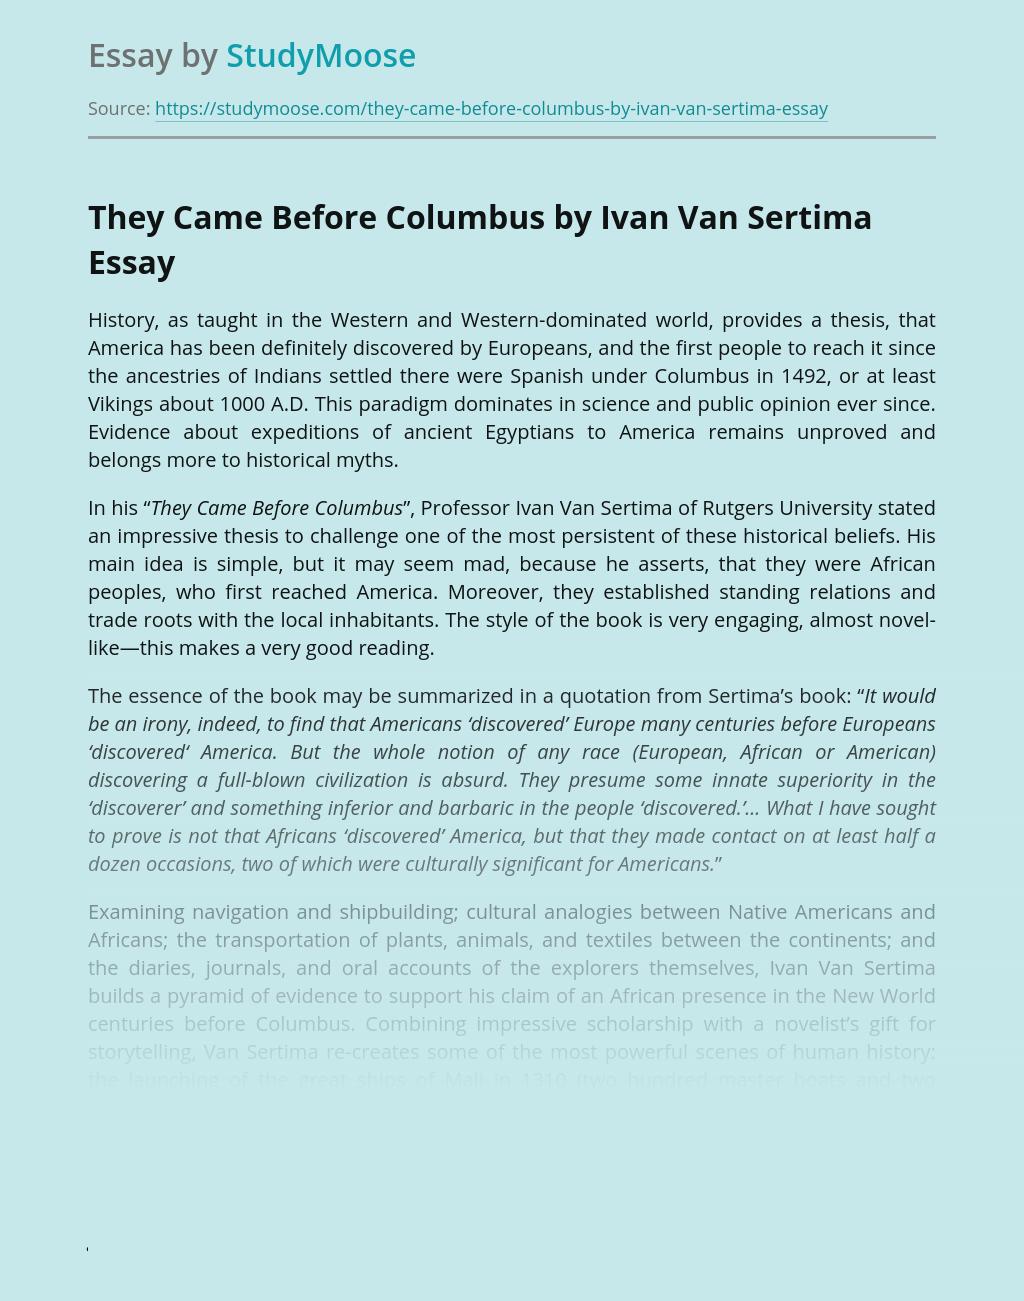 They Came Before Columbus by Ivan Van Sertima